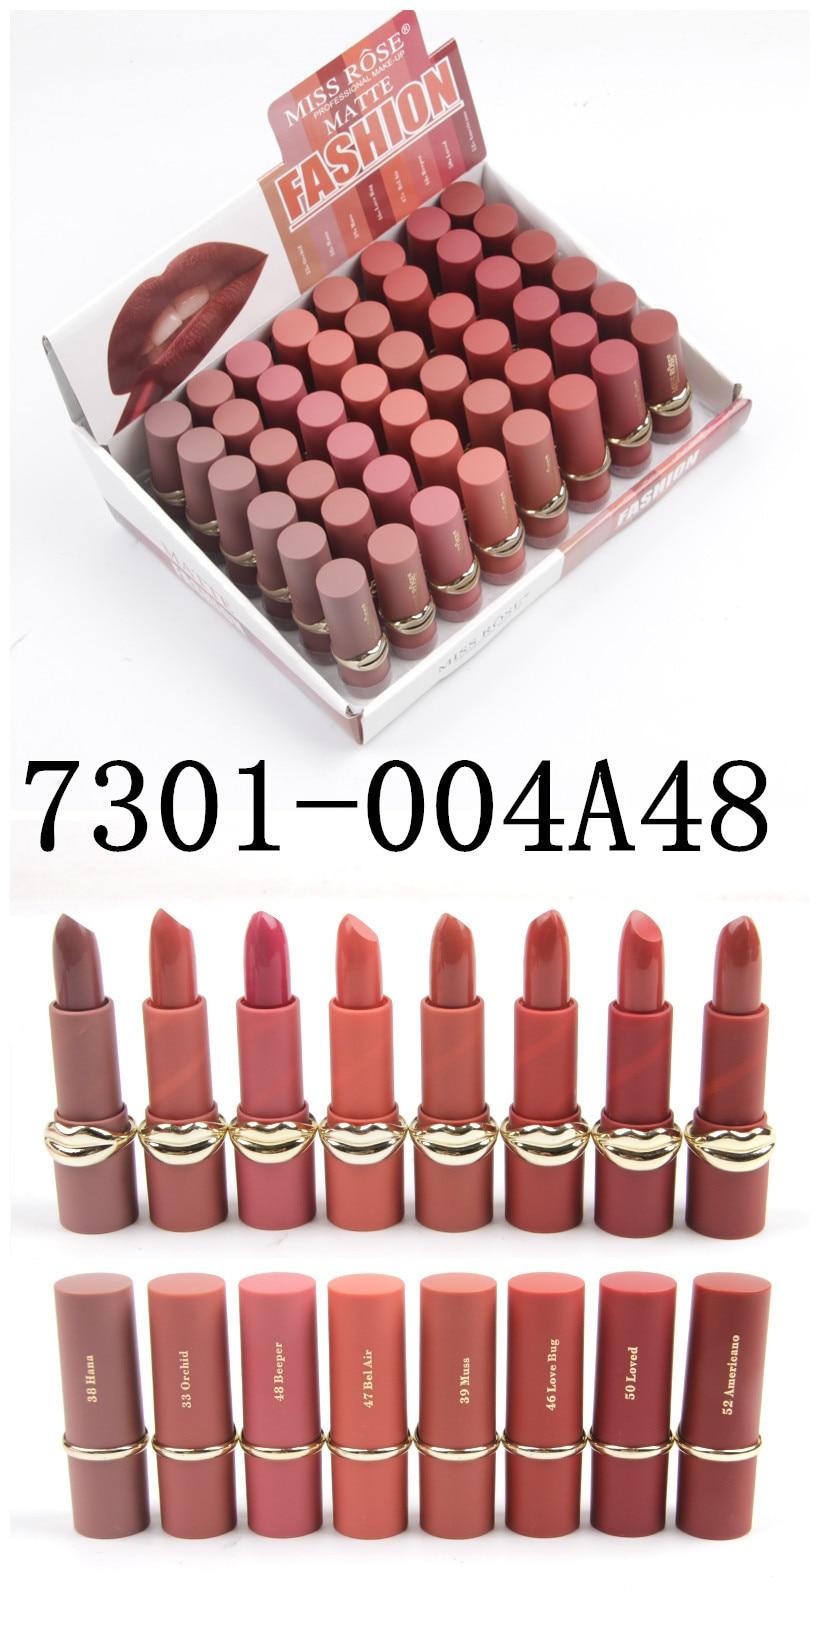 9490787379_307628733